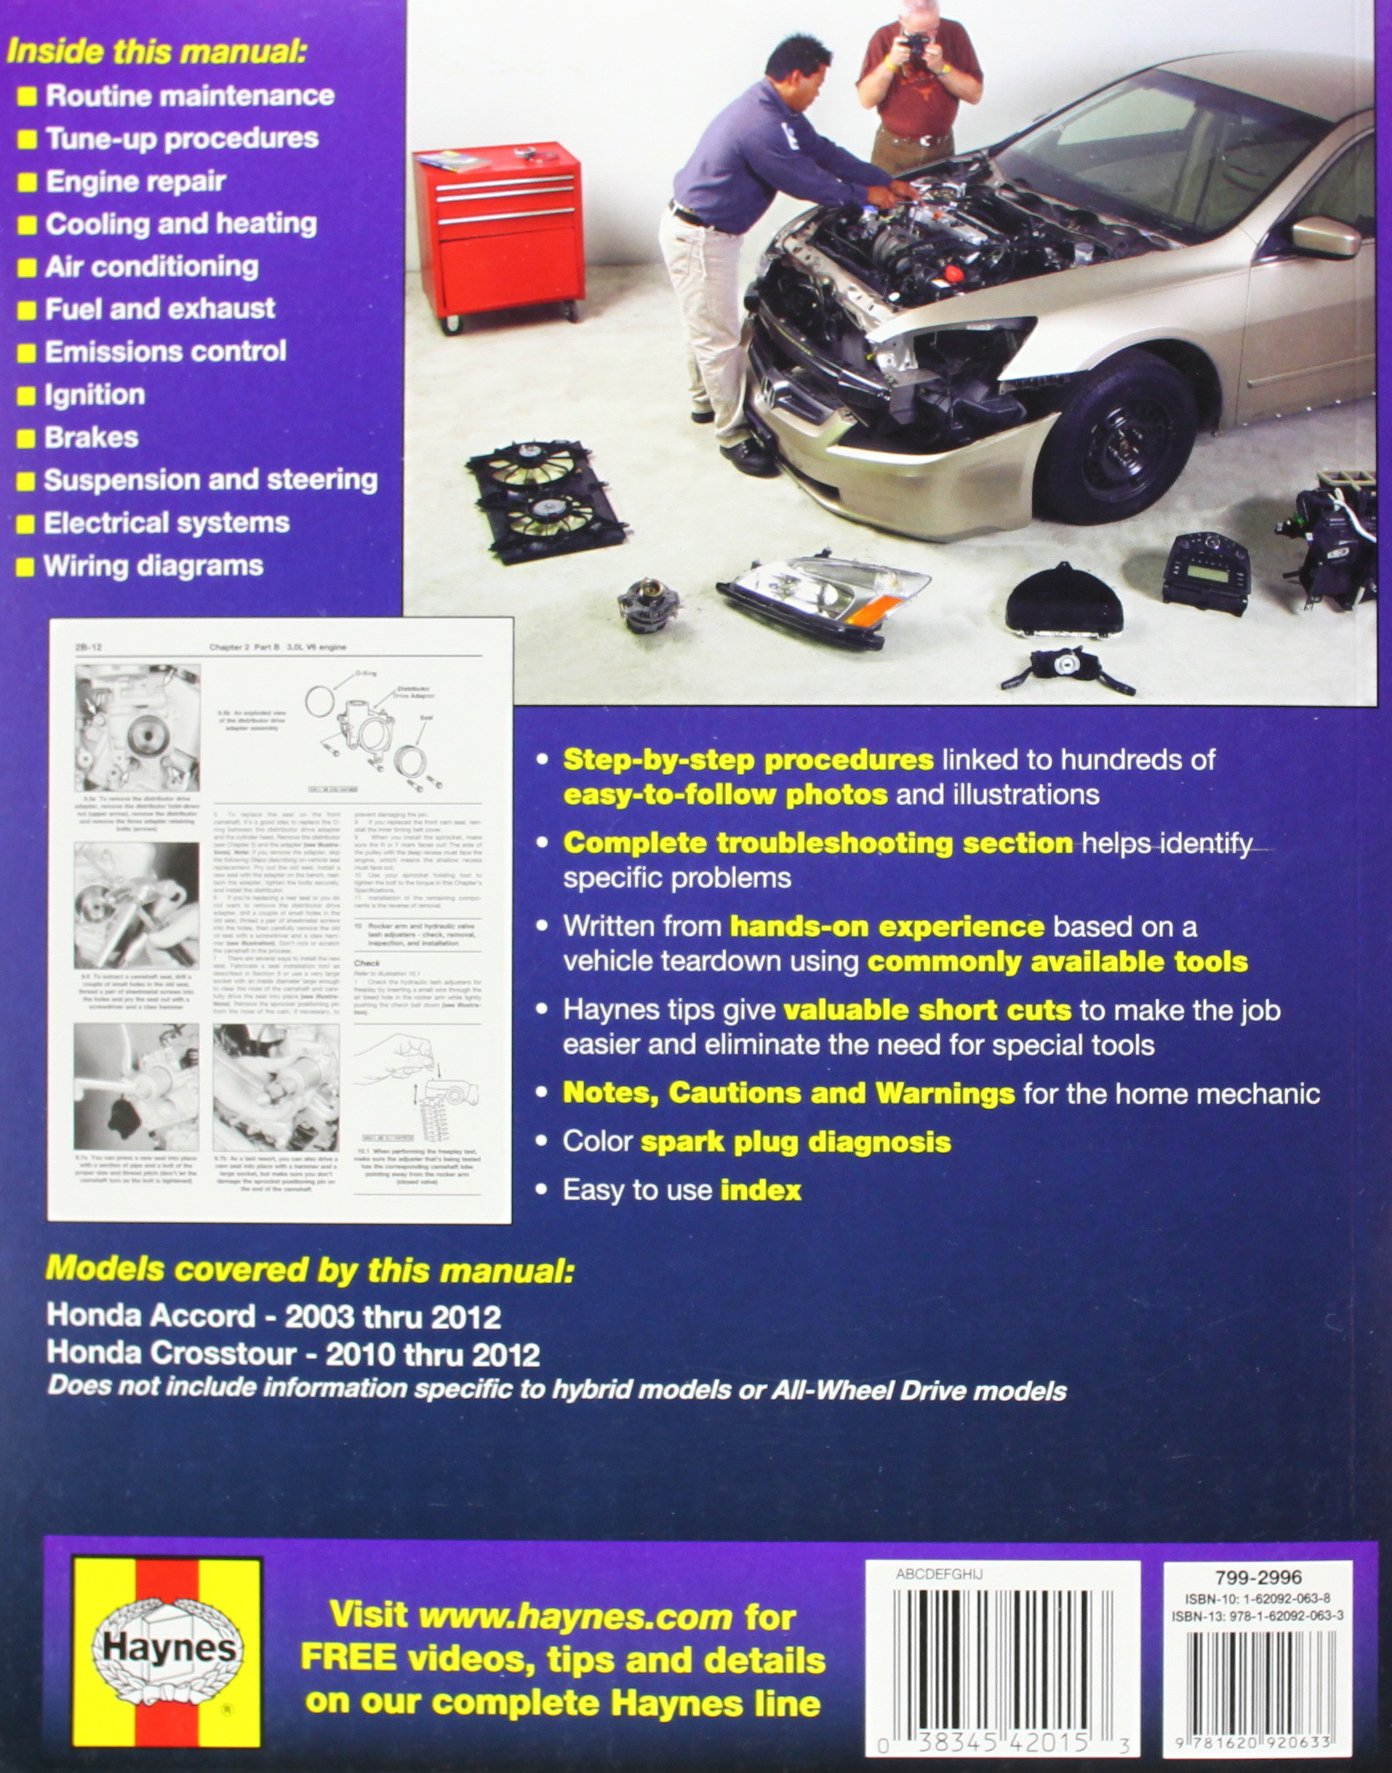 Honda Accord 03-12 Crosstour 10-12: Honda Accord 2003 thru 2012 Crosstour  2010 thru 2012 (Haynes Automotive Repair Manuals): Editors of Haynes Manuals:  ...